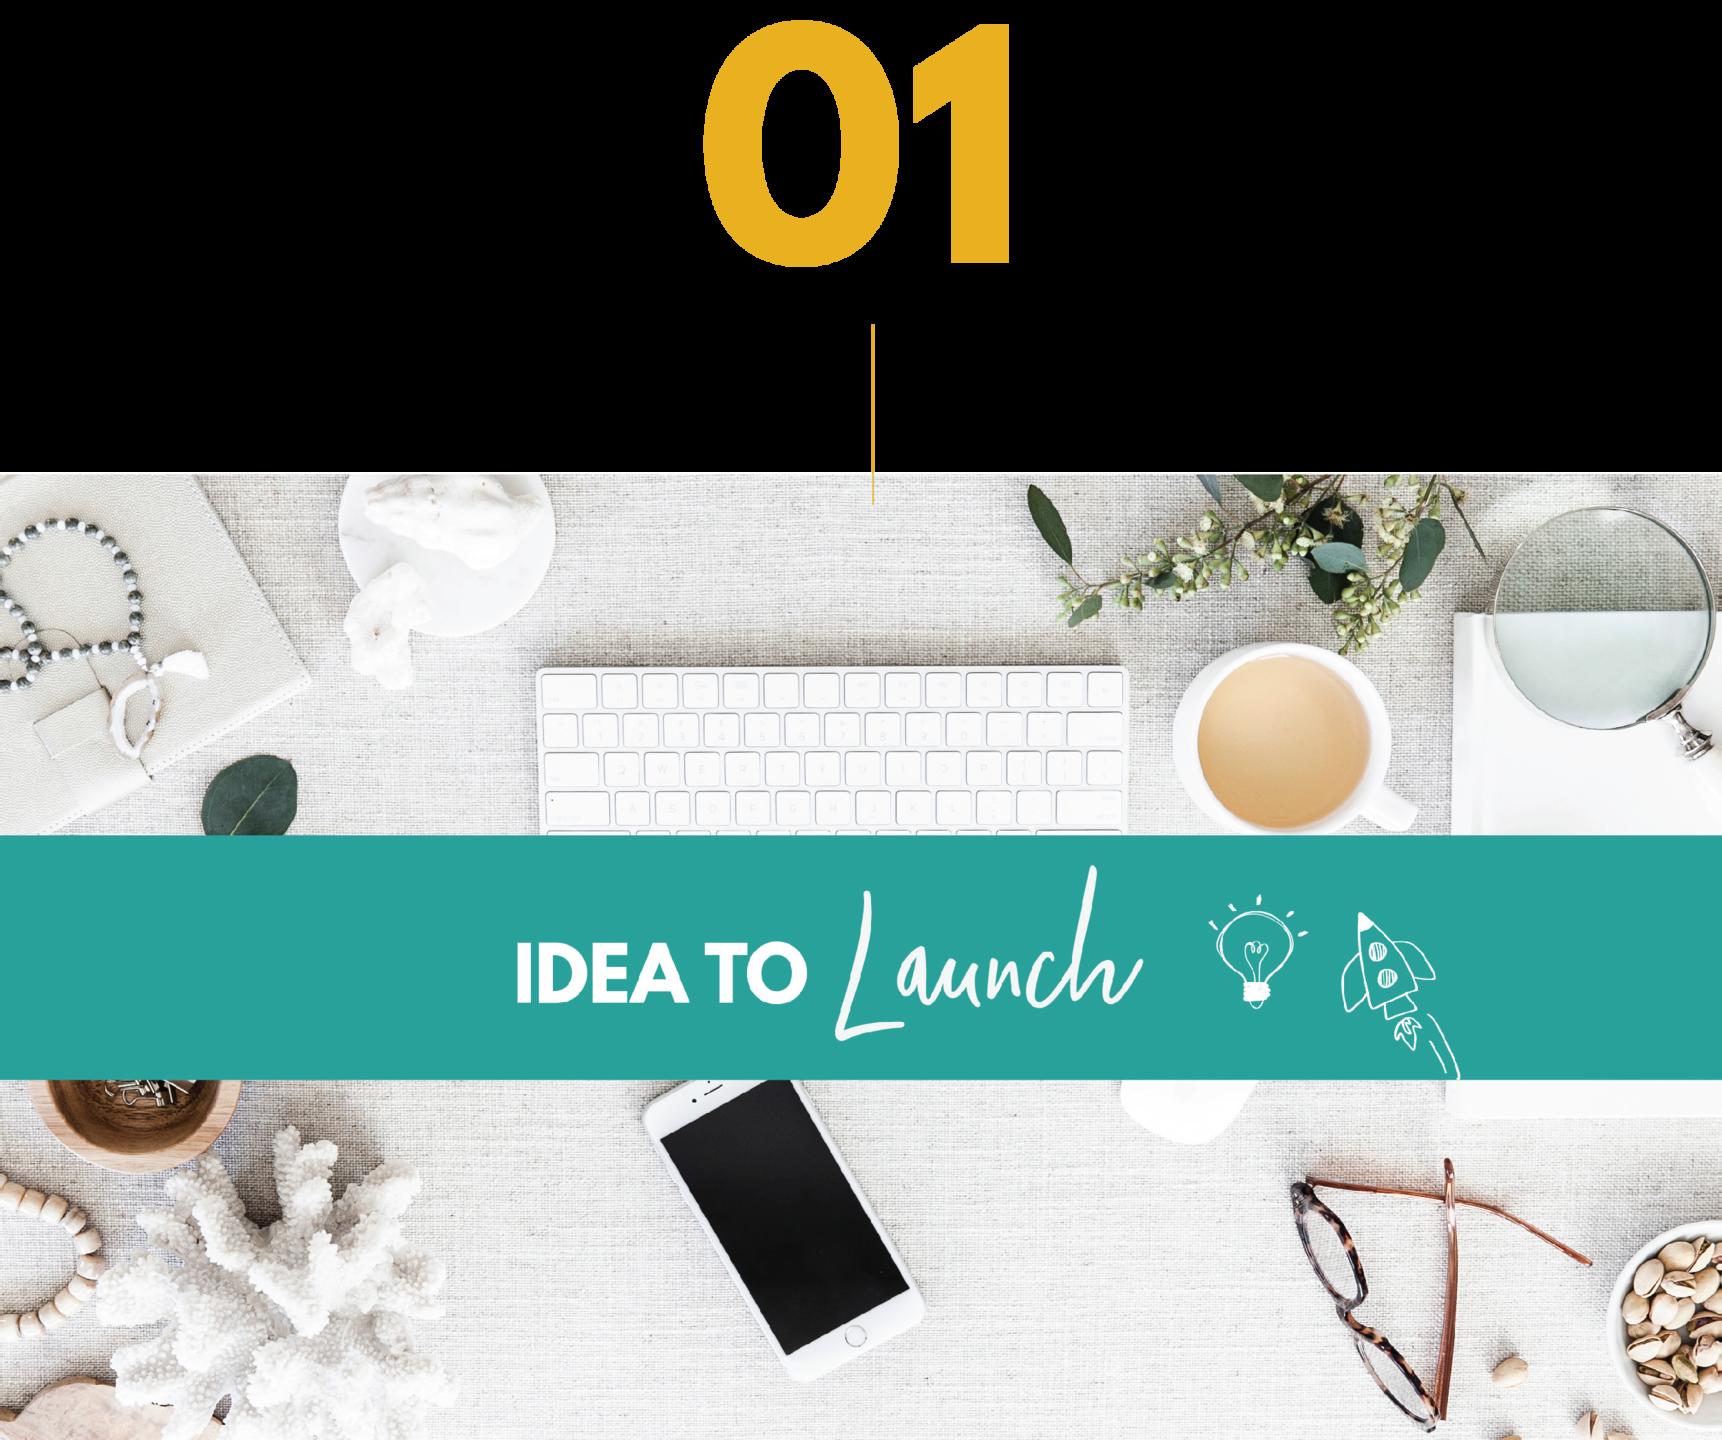 Tina Tower How To Start Kajabi Online Course